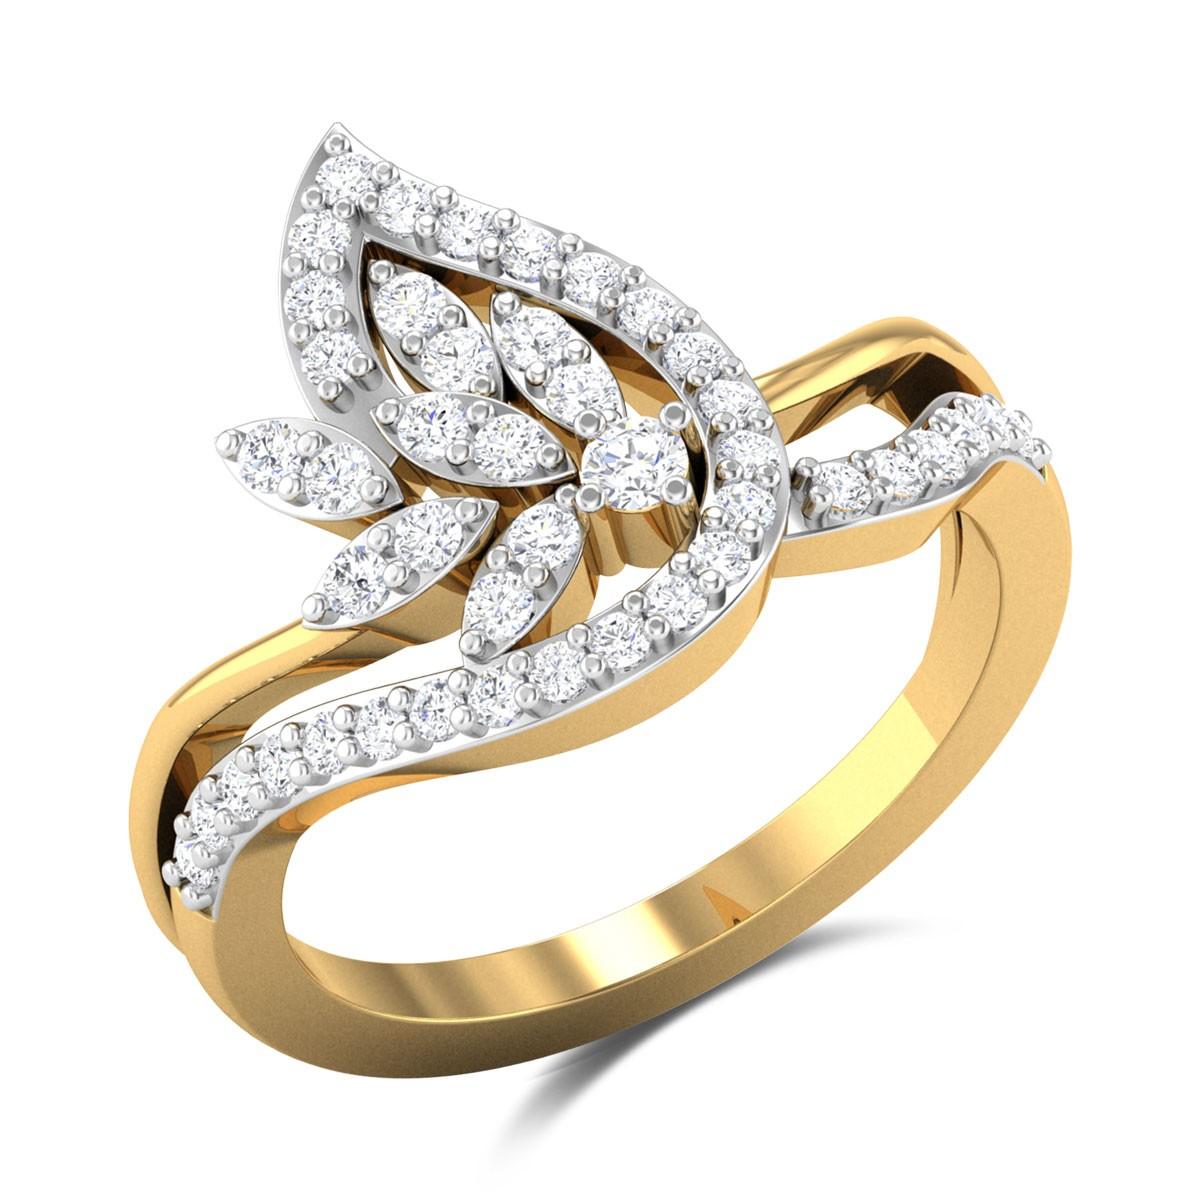 Johann Wavy Floral Diamond Ring